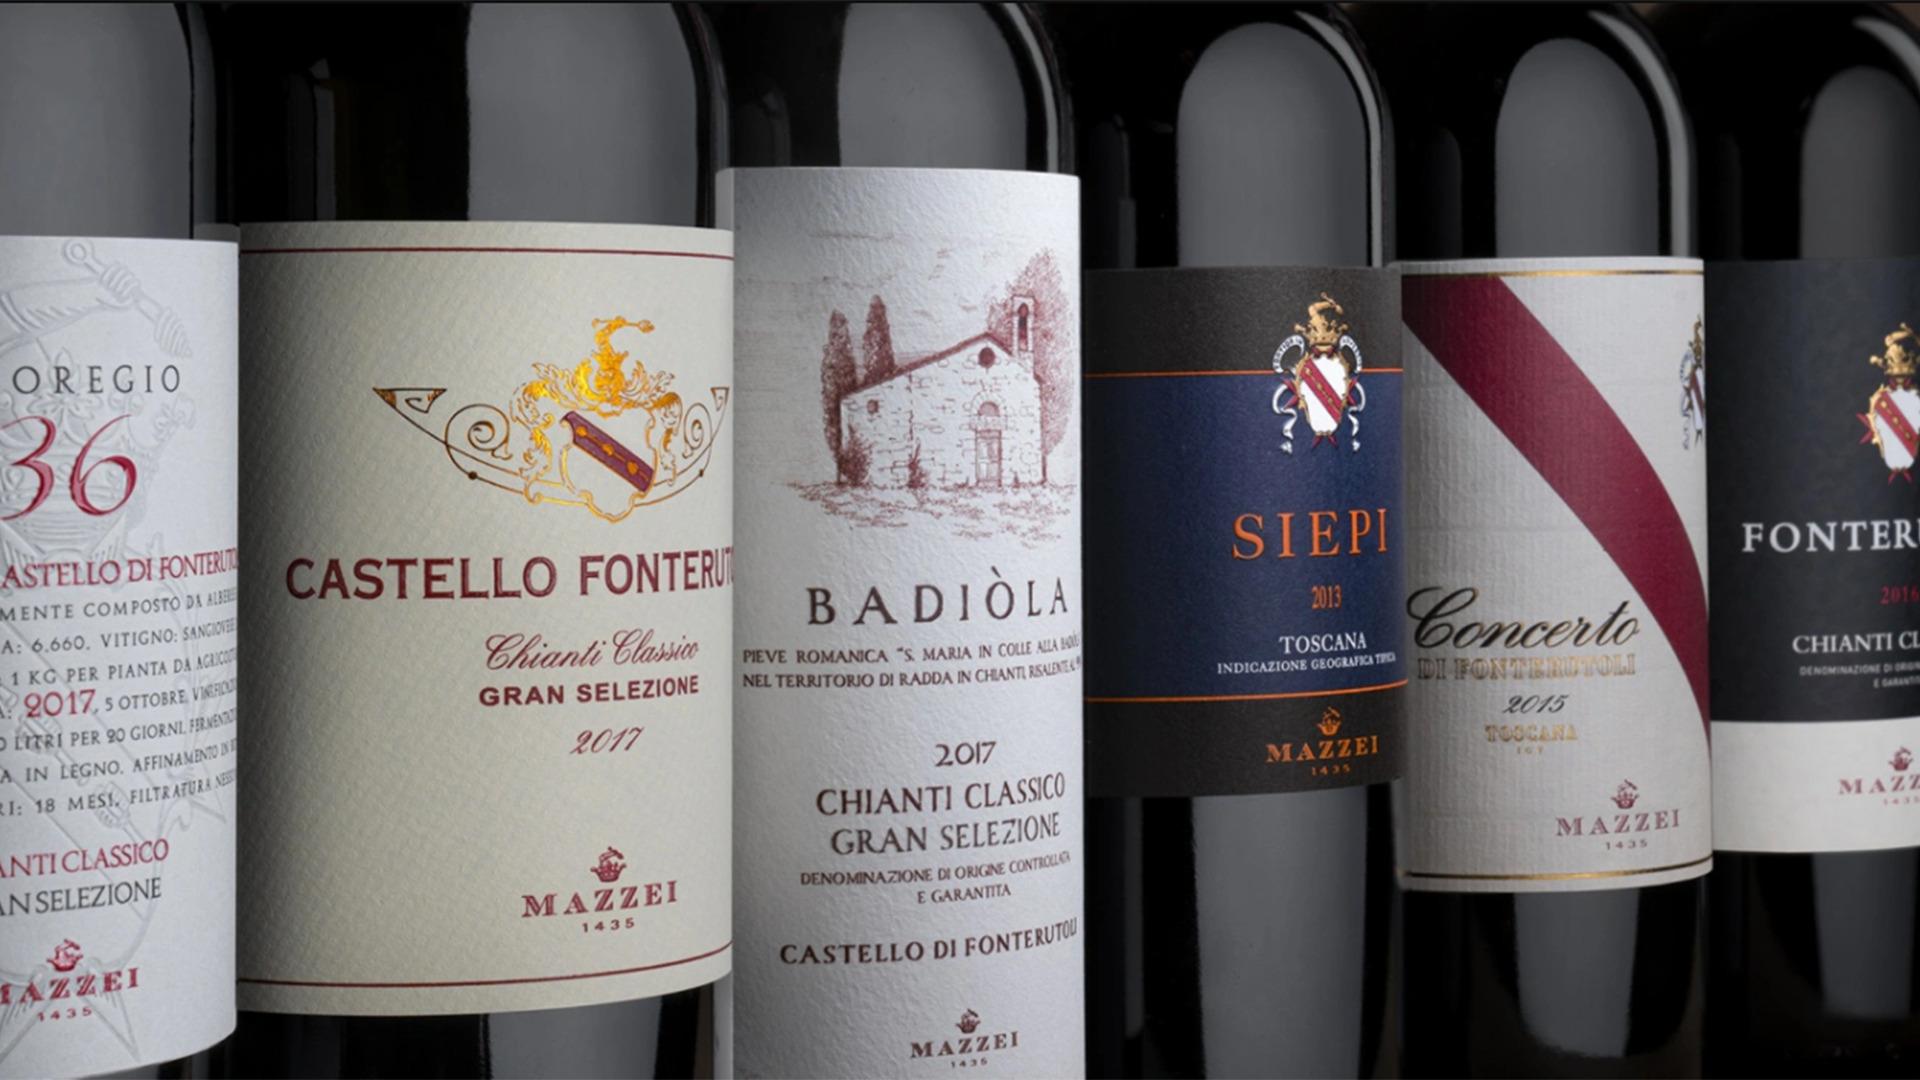 Rượu Vang Castello di Fonterutoli - Mazzei